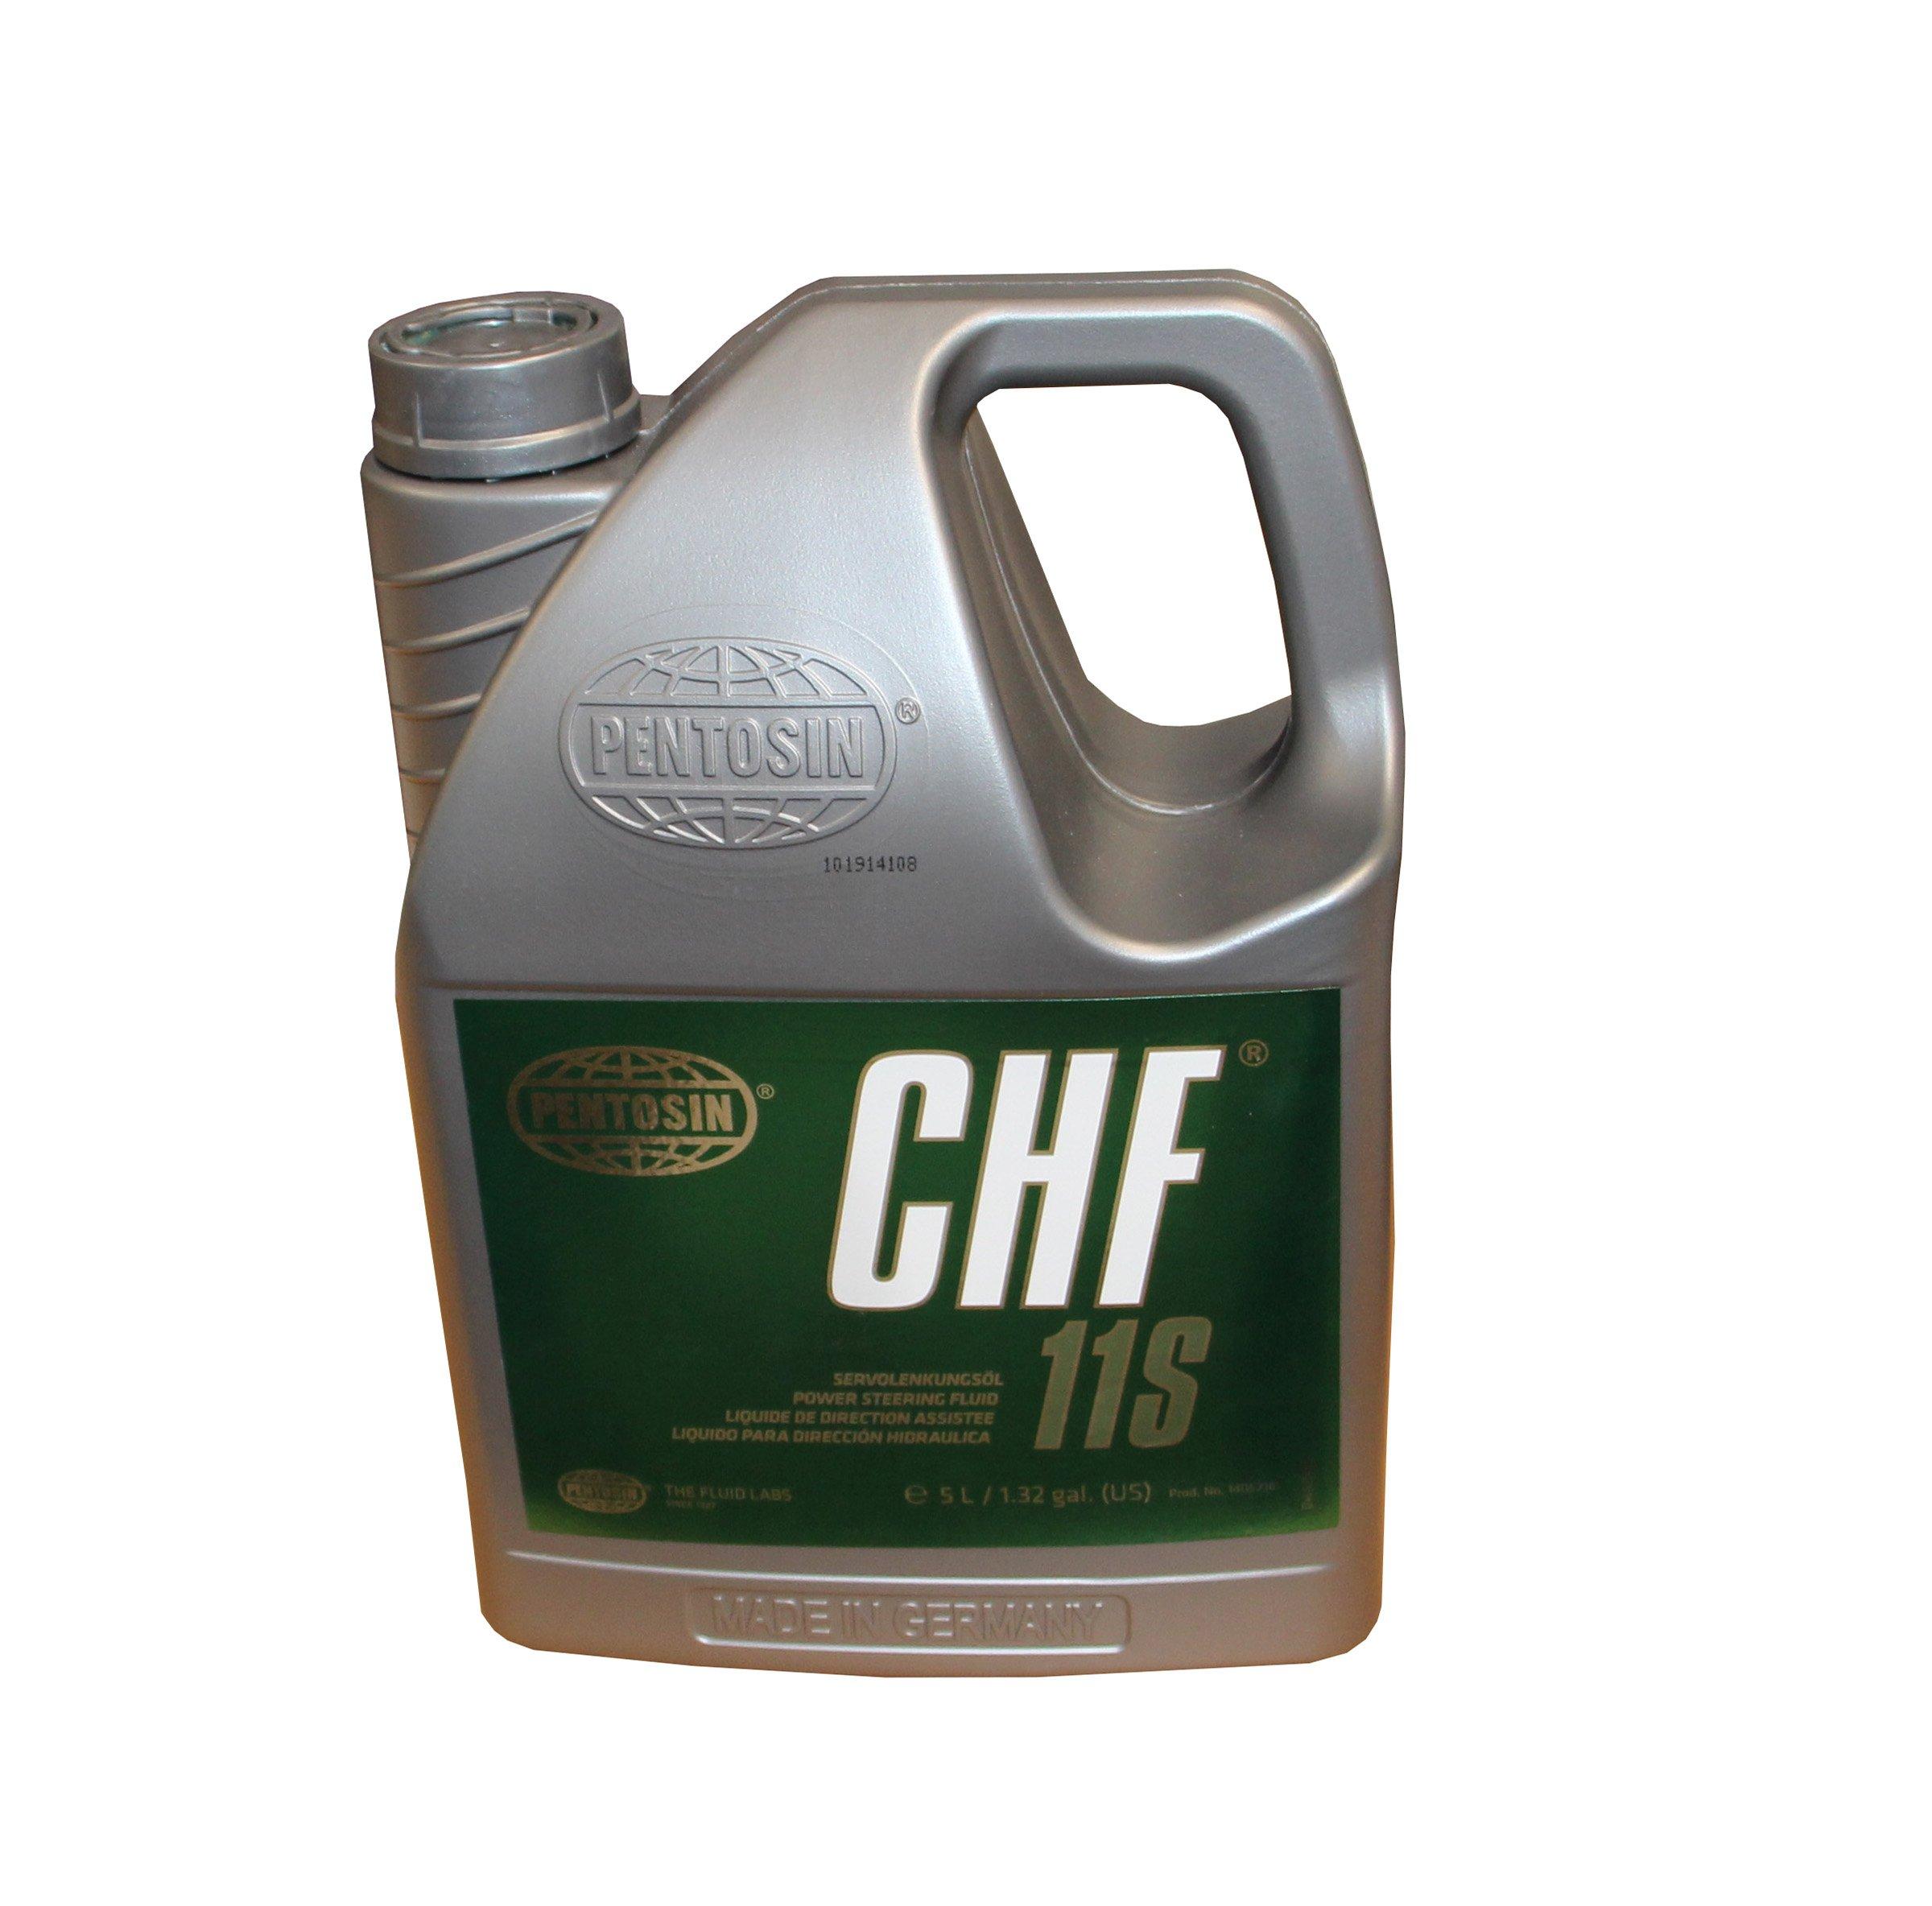 CRP Automotive Pentosin 1405216 CHF 11S Synthetic Hydraulic Fluid, 5 Liter